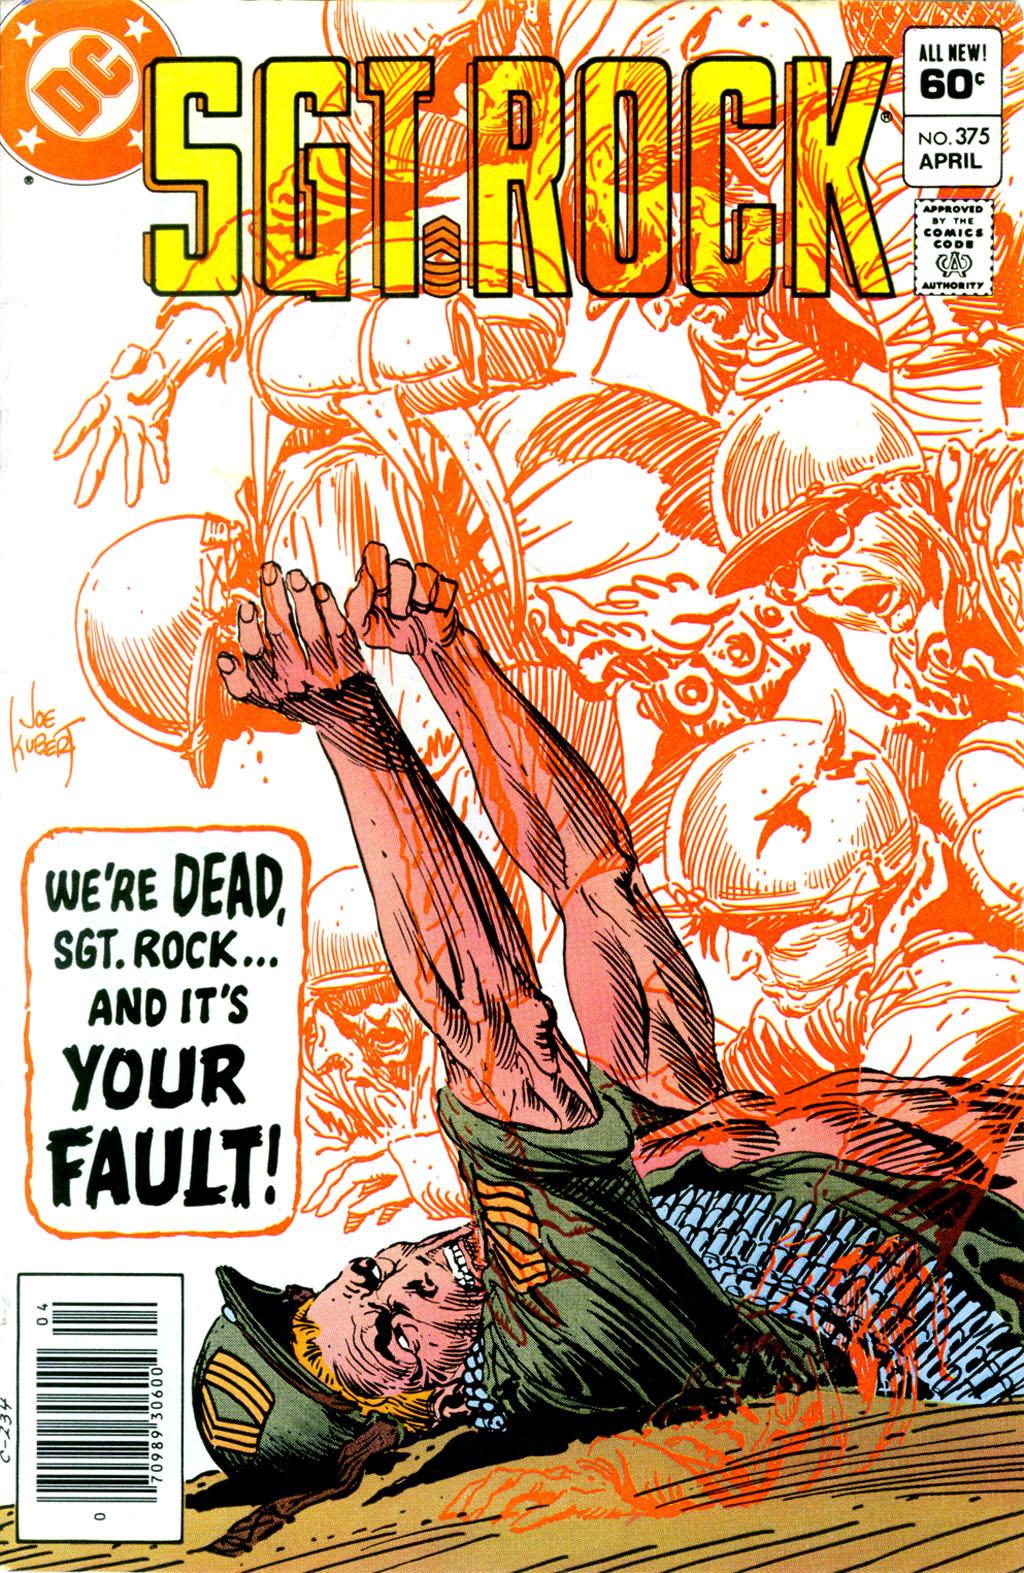 Read online Sgt. Rock comic -  Issue #375 - 1